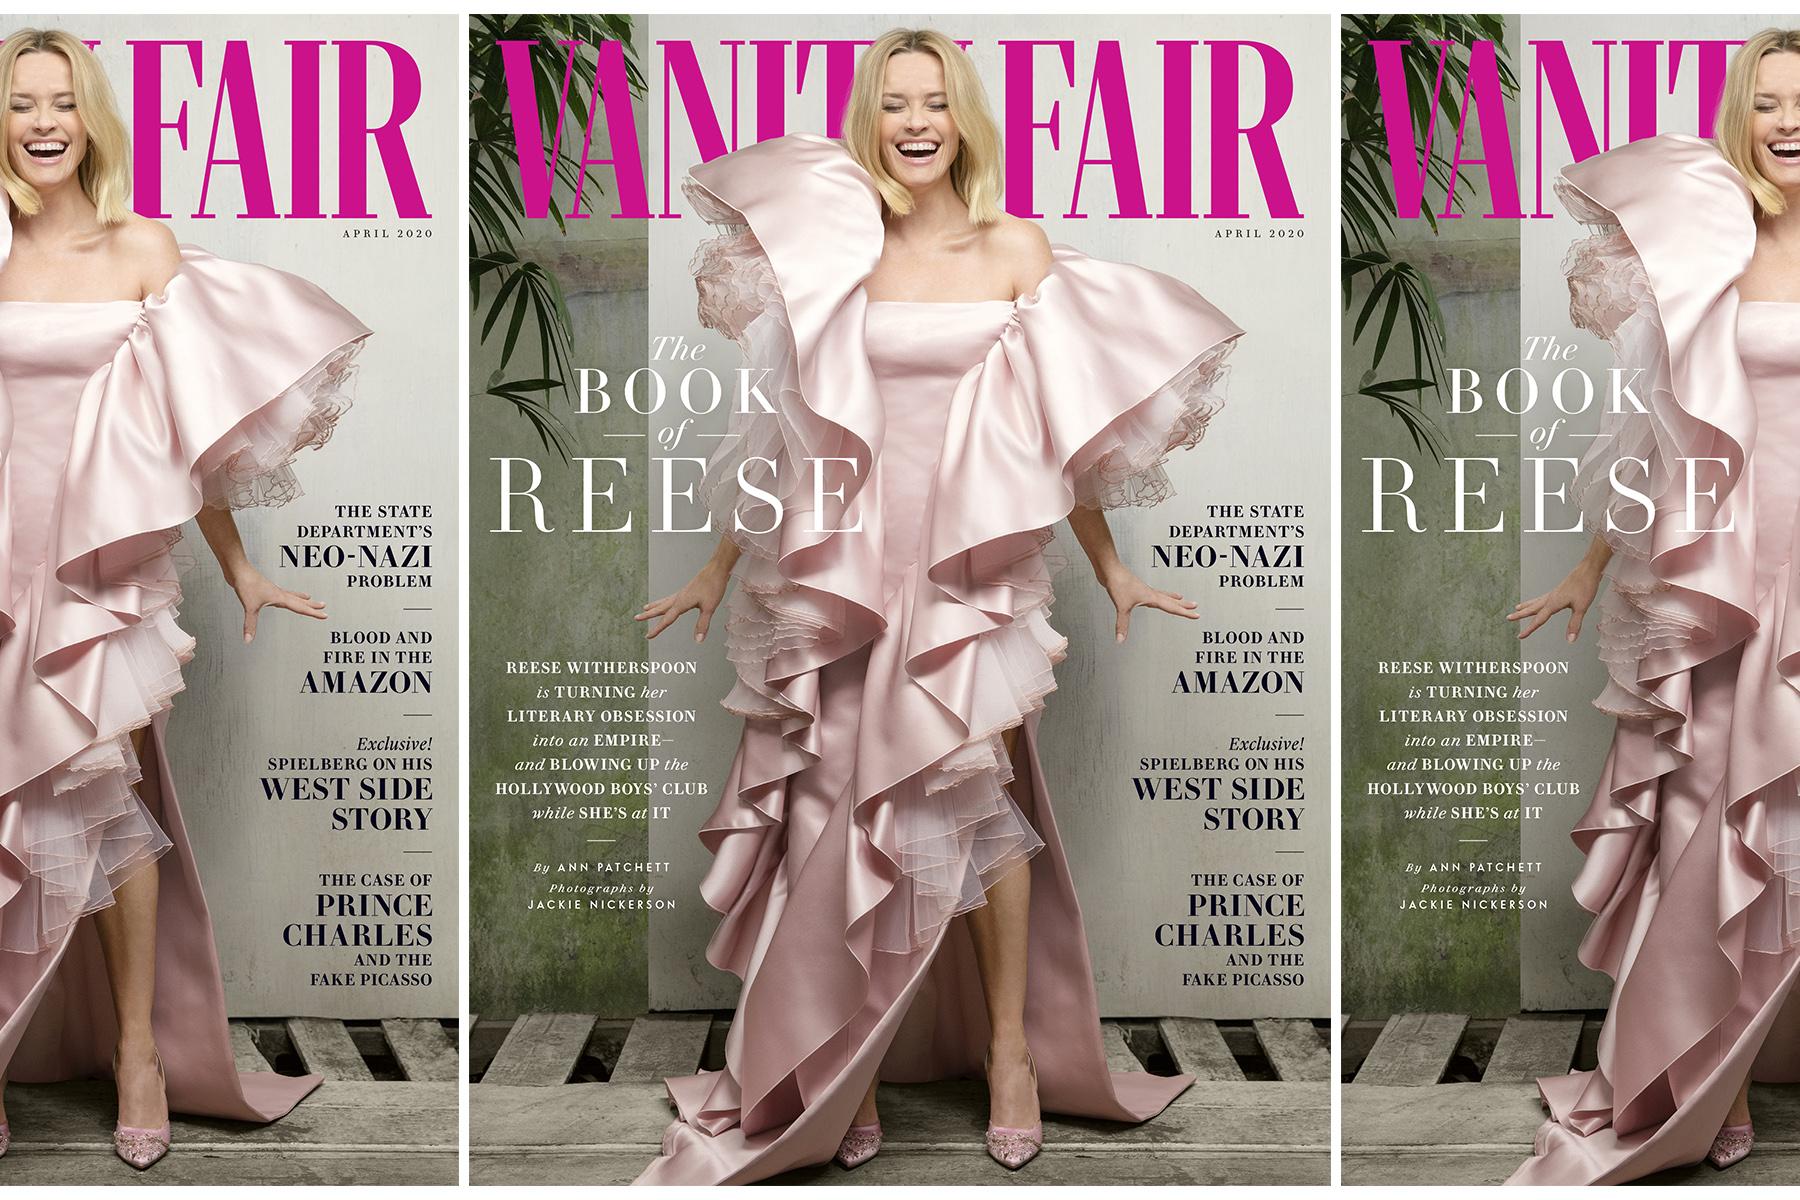 The latest Vanity Fair cover